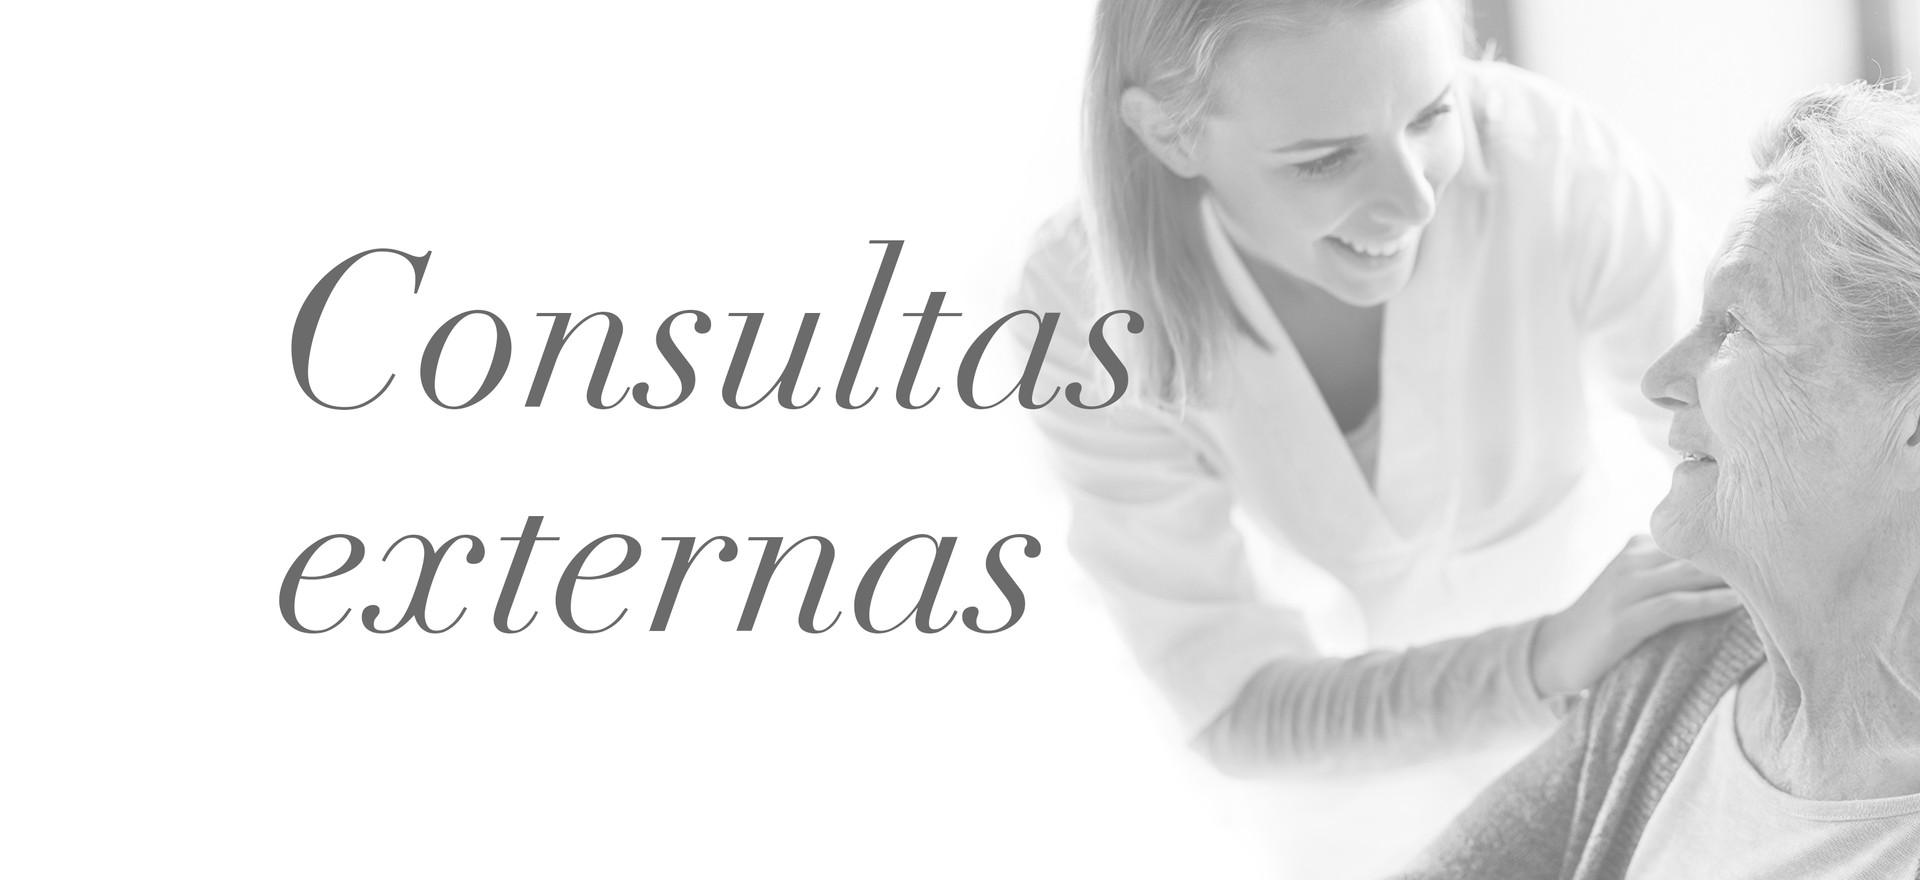 Servicios /// Consultas externas